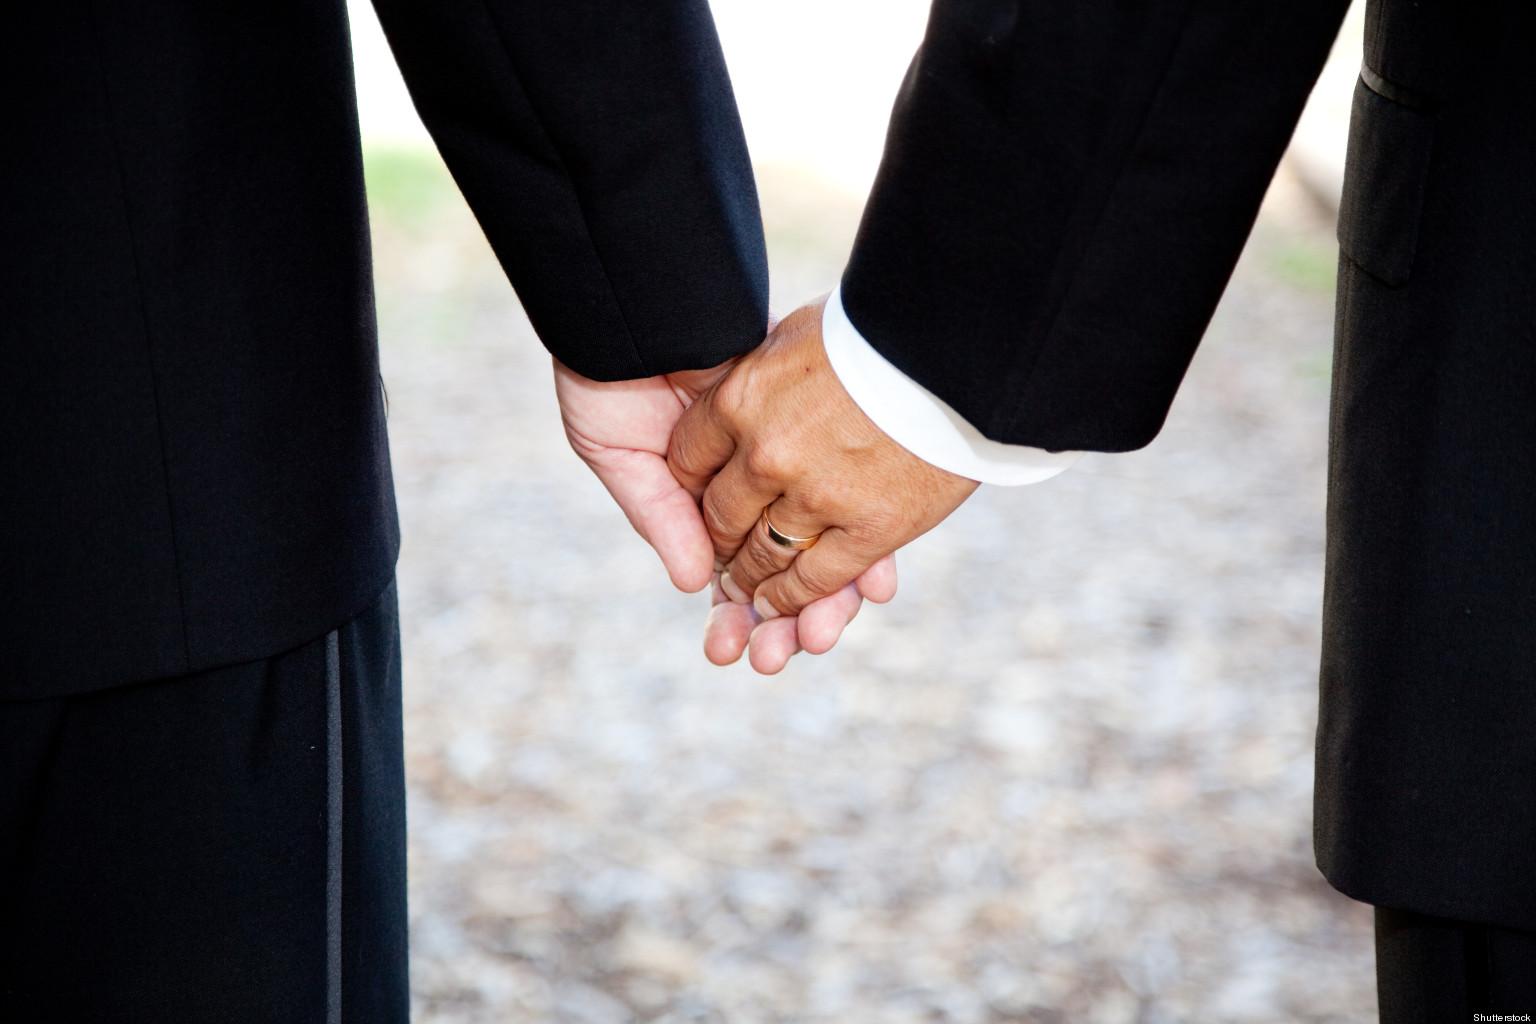 Руки у гомосексуалистов 12 фотография